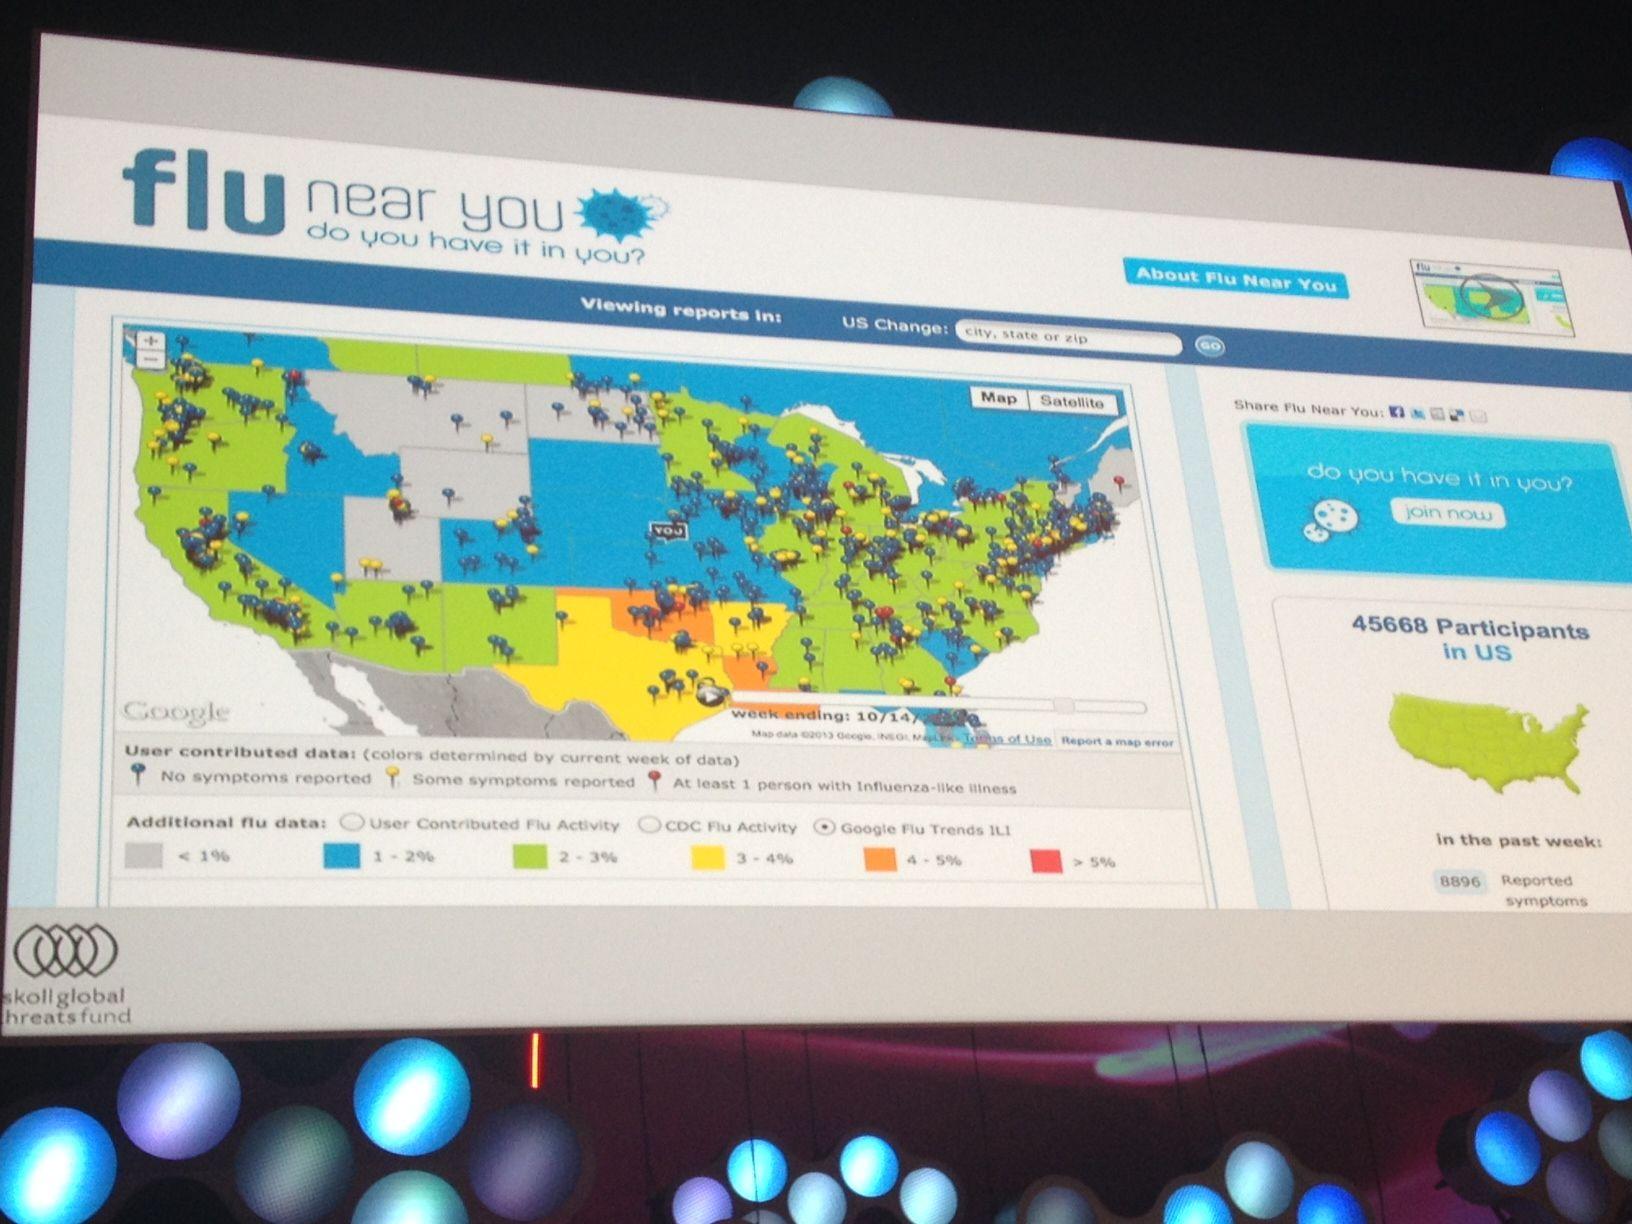 Interactive Flu Map At TEDMED TEDMED TALKS Pinterest Flu - Current us flu map